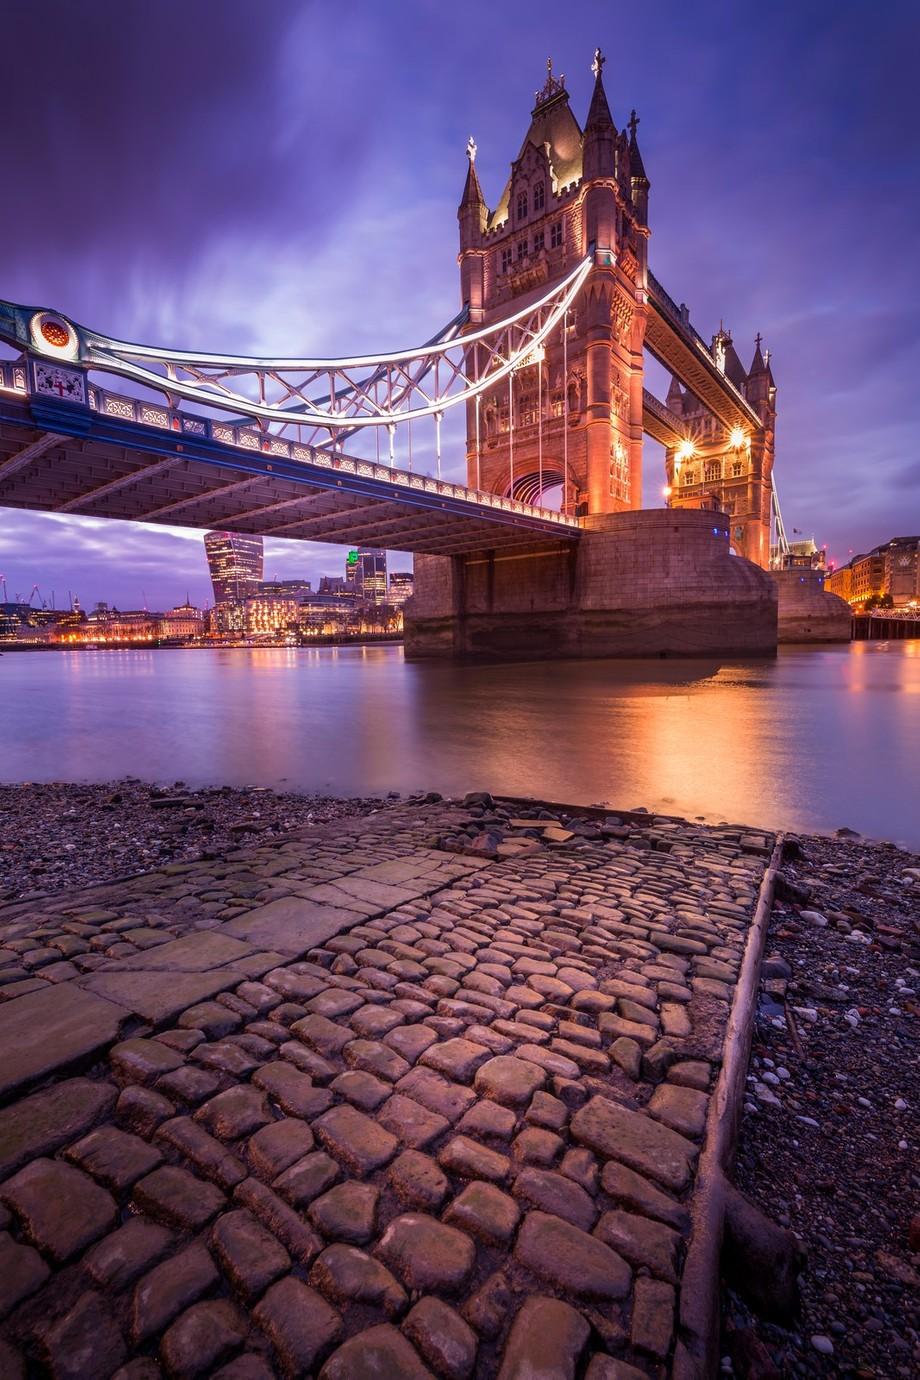 London Tower Bridge Winter Sunset by Merakiphotographer